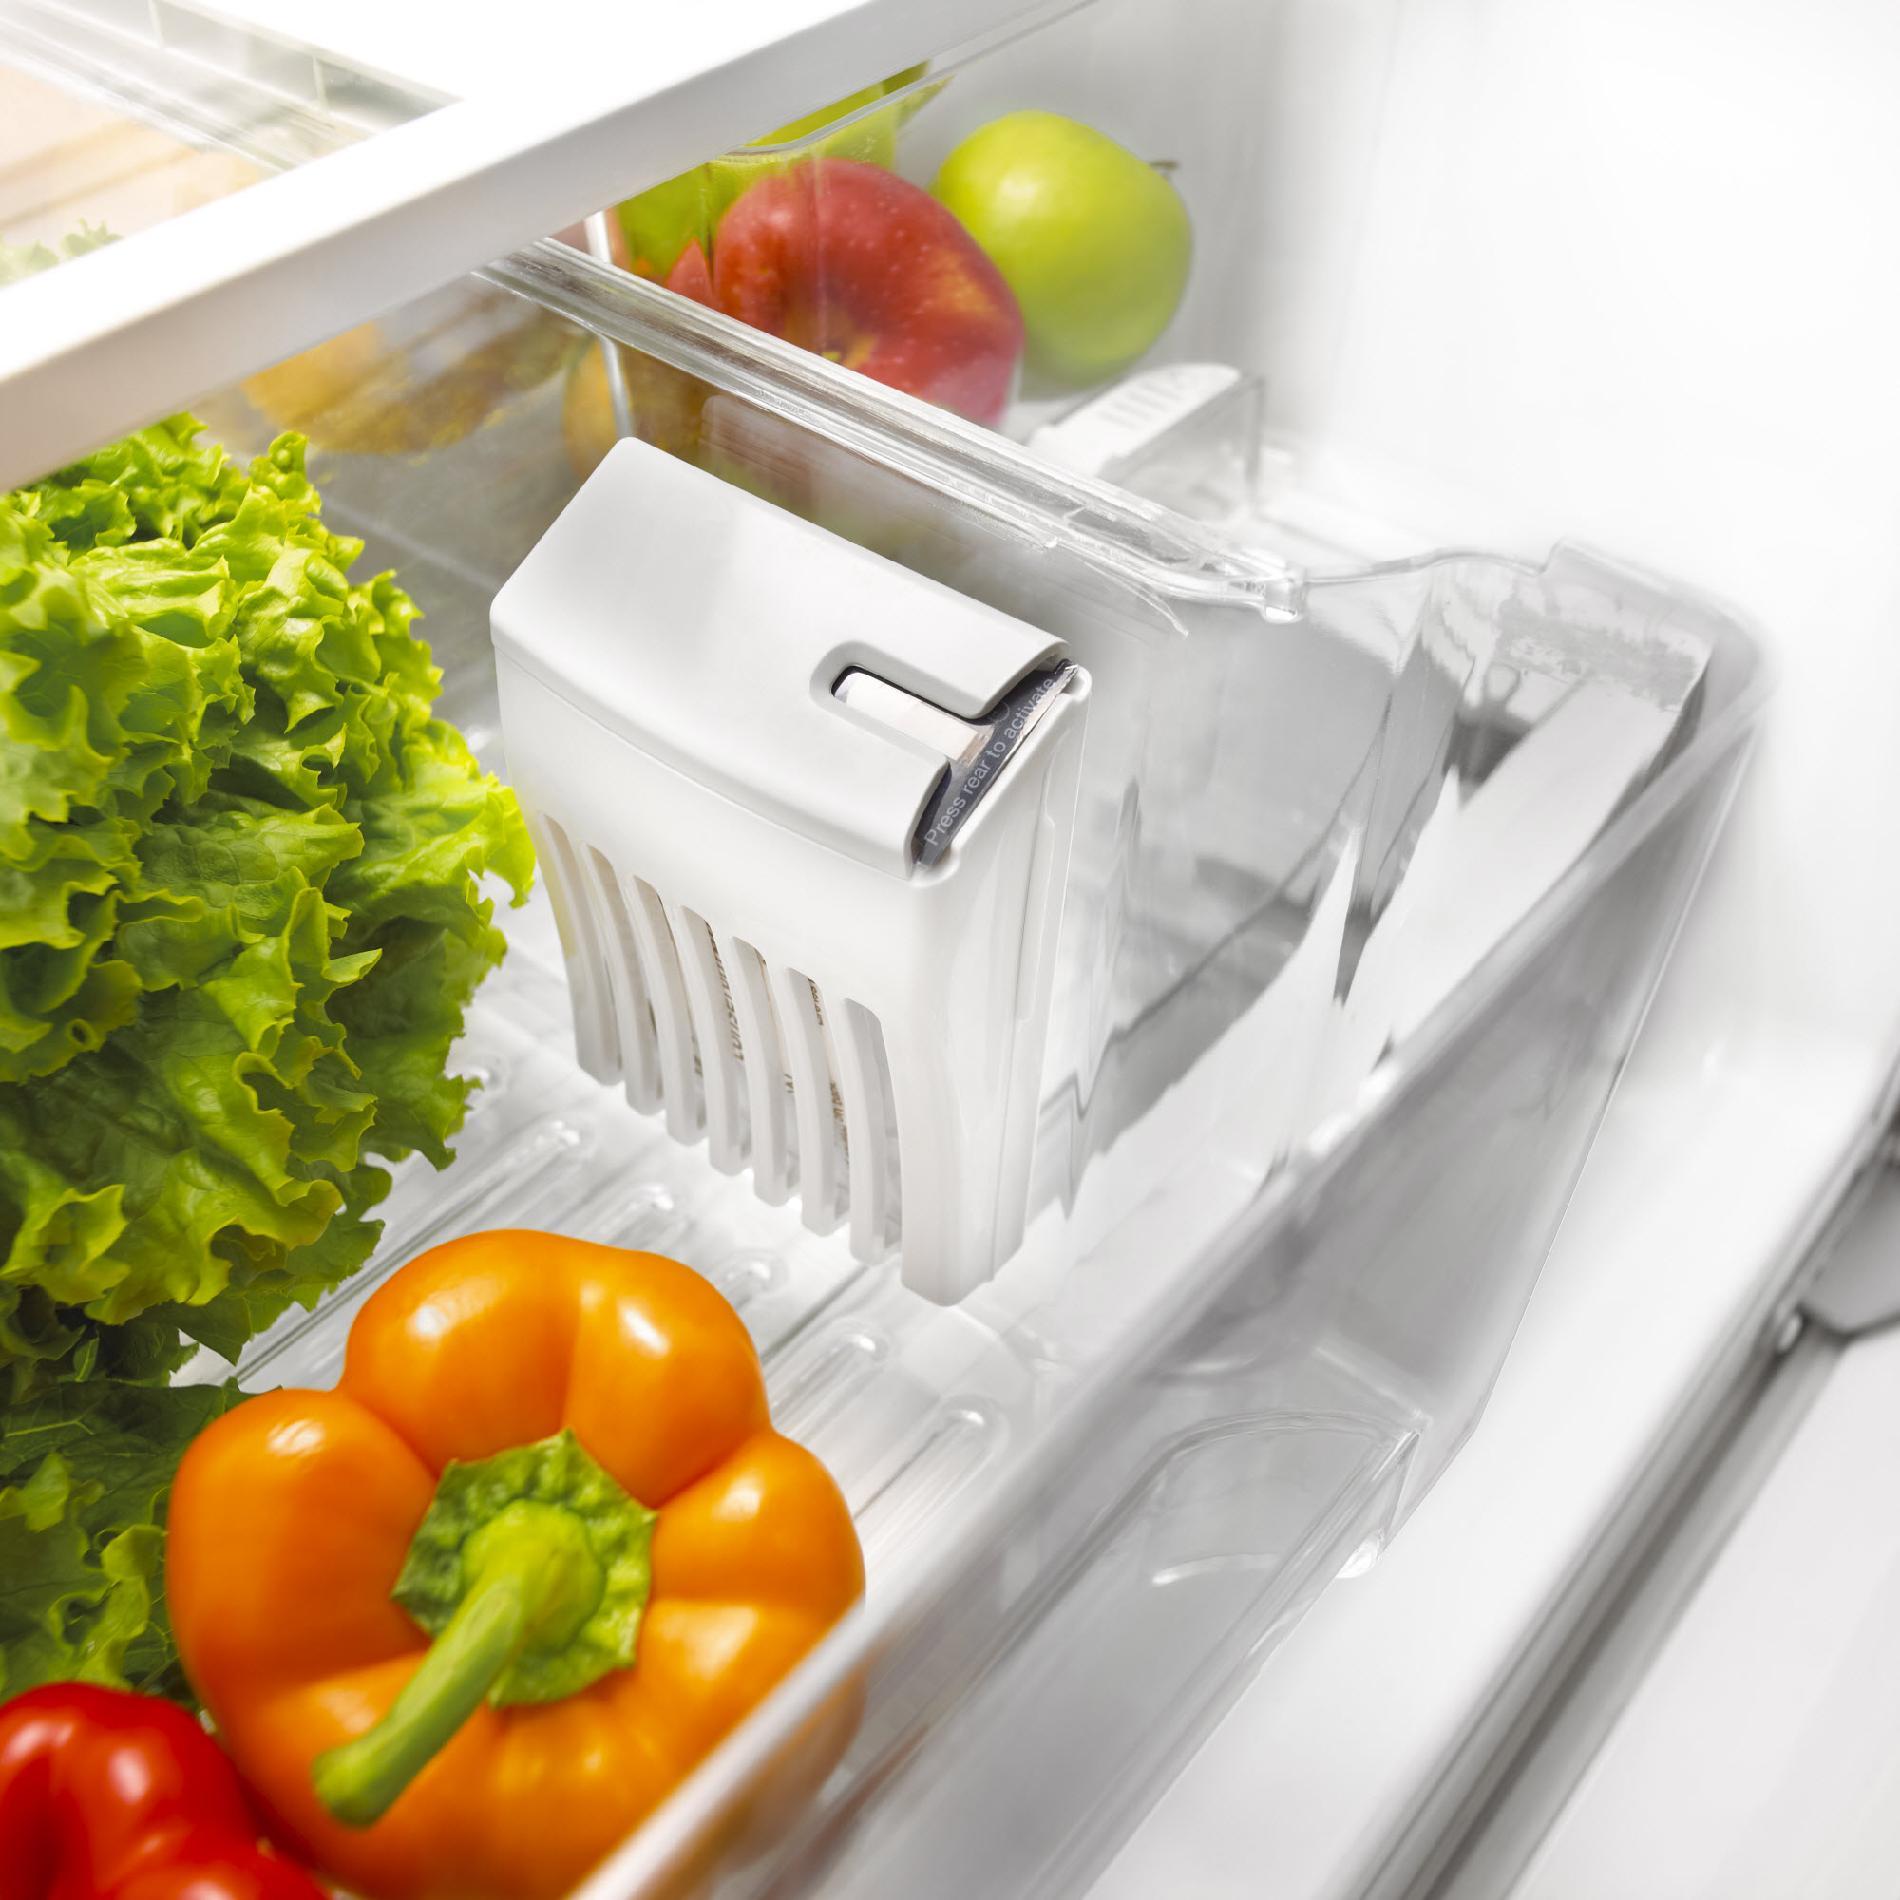 Maytag 20 cu. ft. French-Door Refrigerator w/ Strongbox™ Door Bins - White